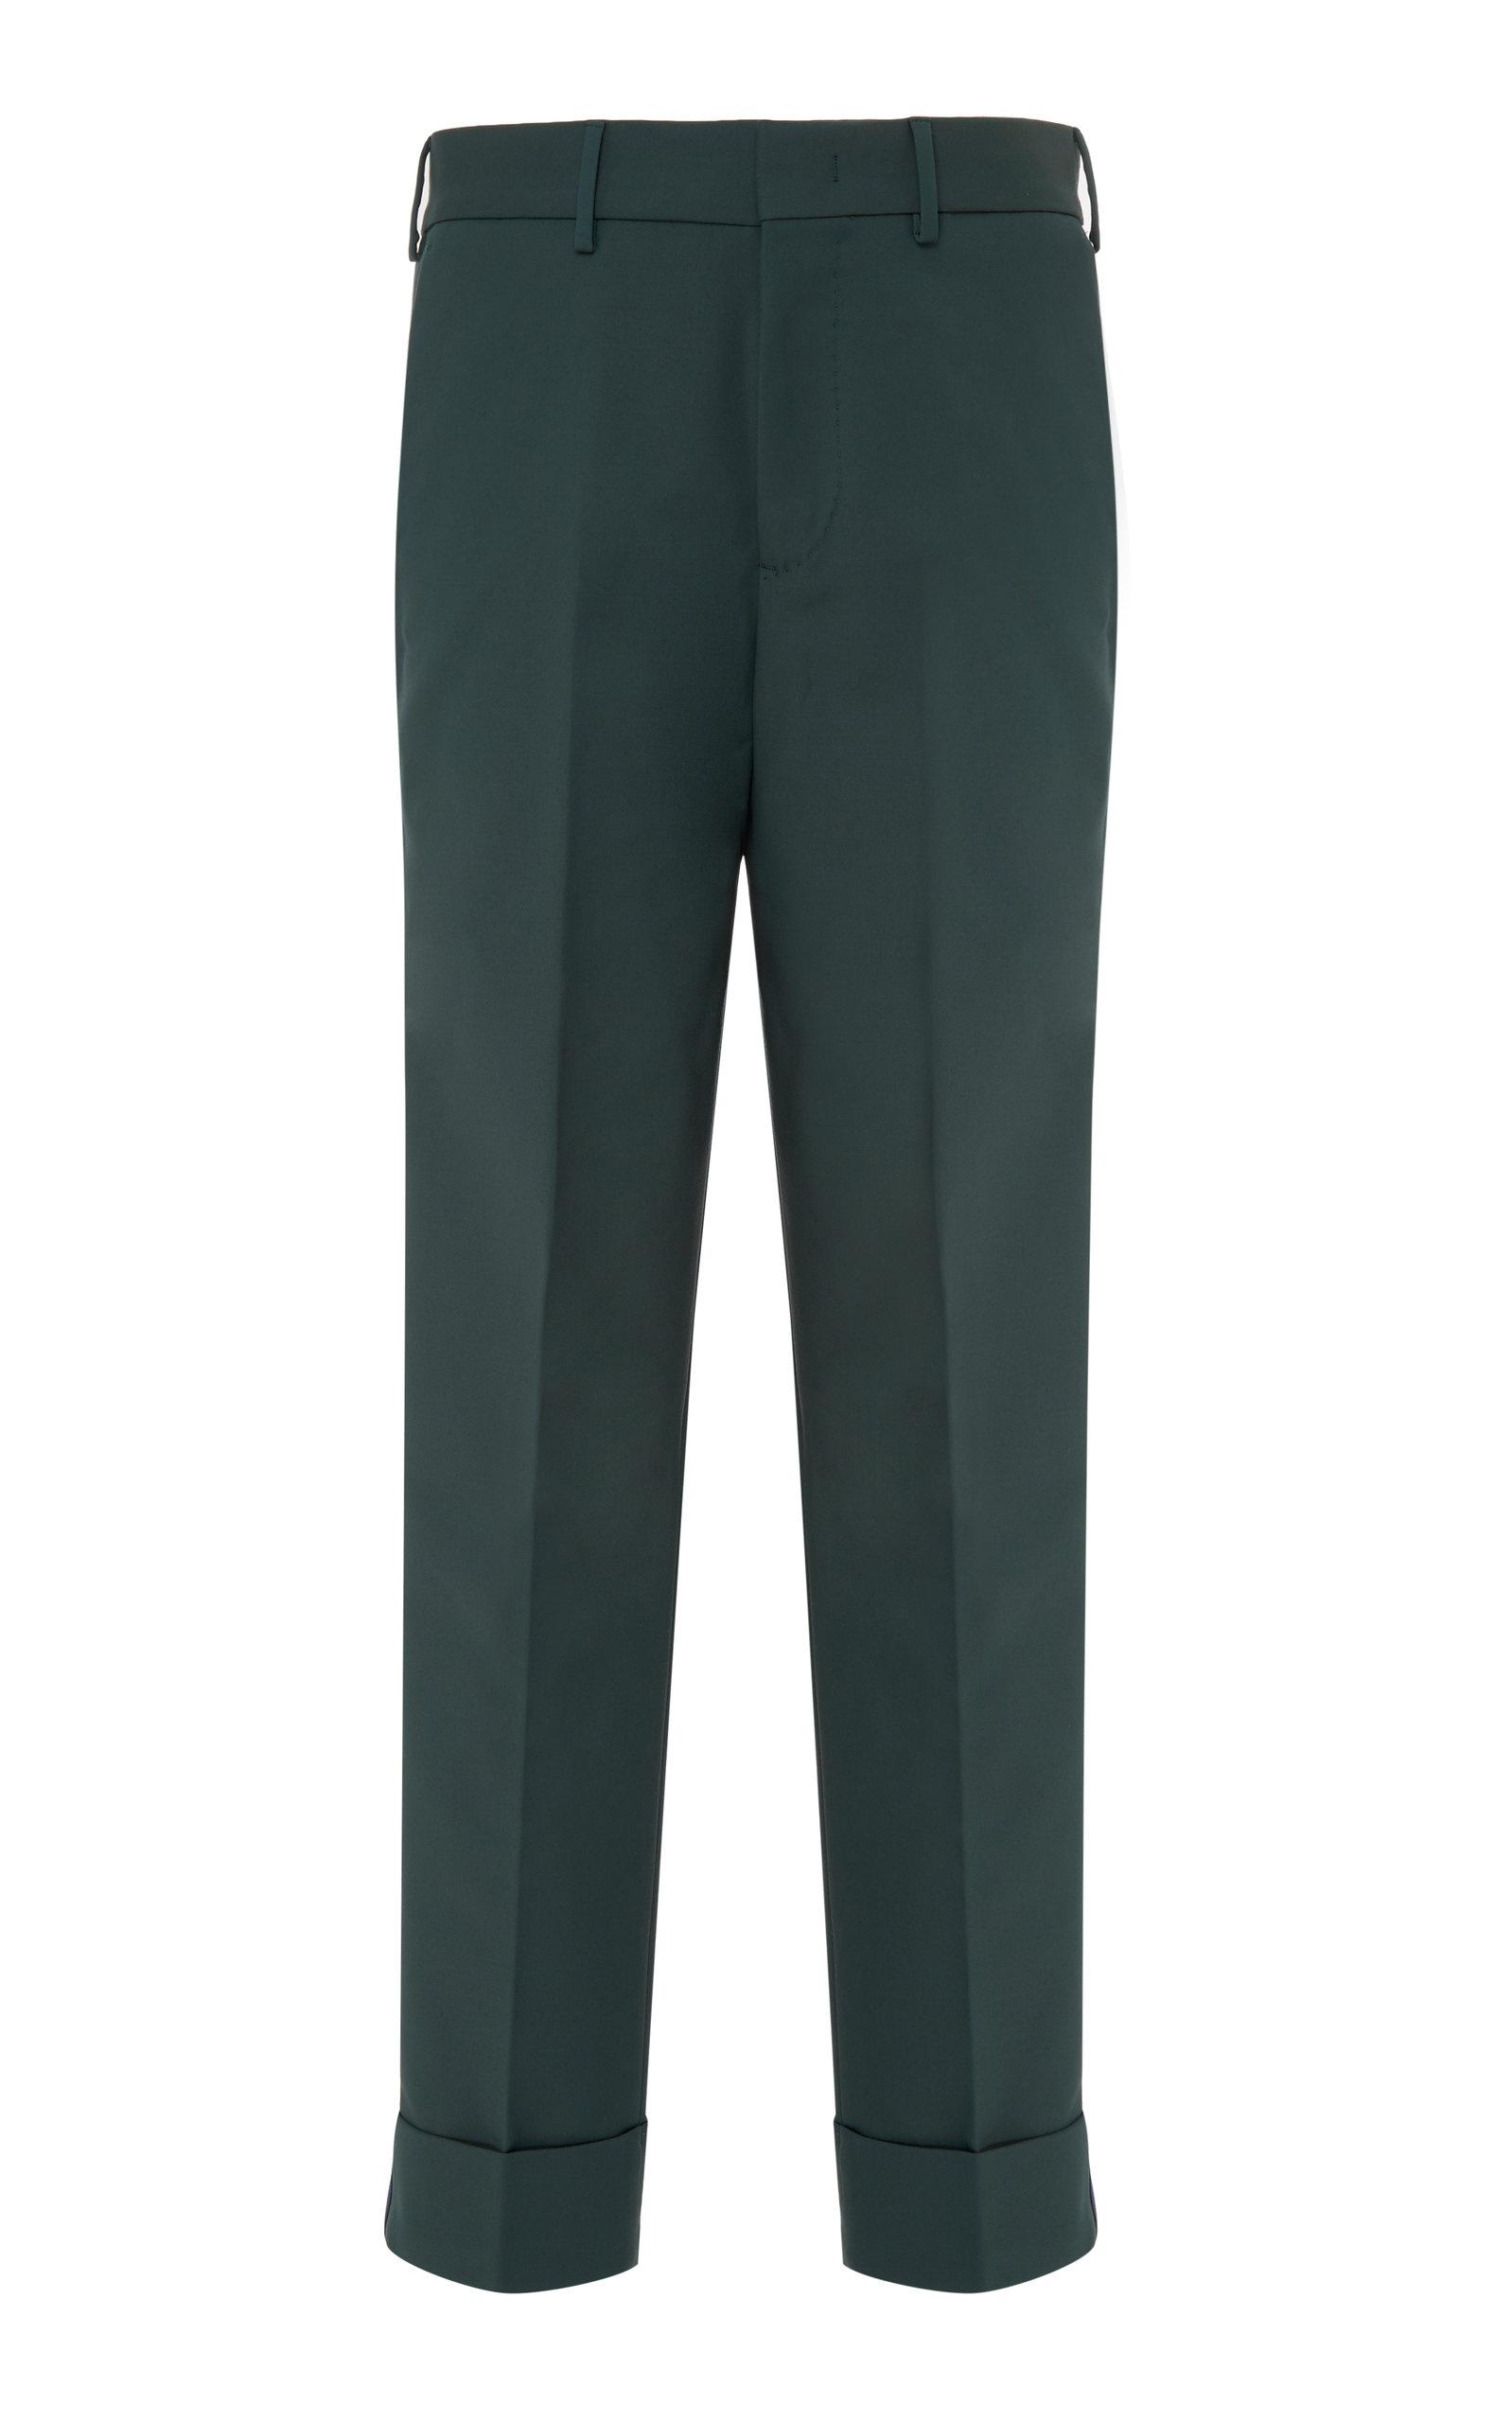 PT FORWARD Side Stripe Cotton-Blend Pants in Green